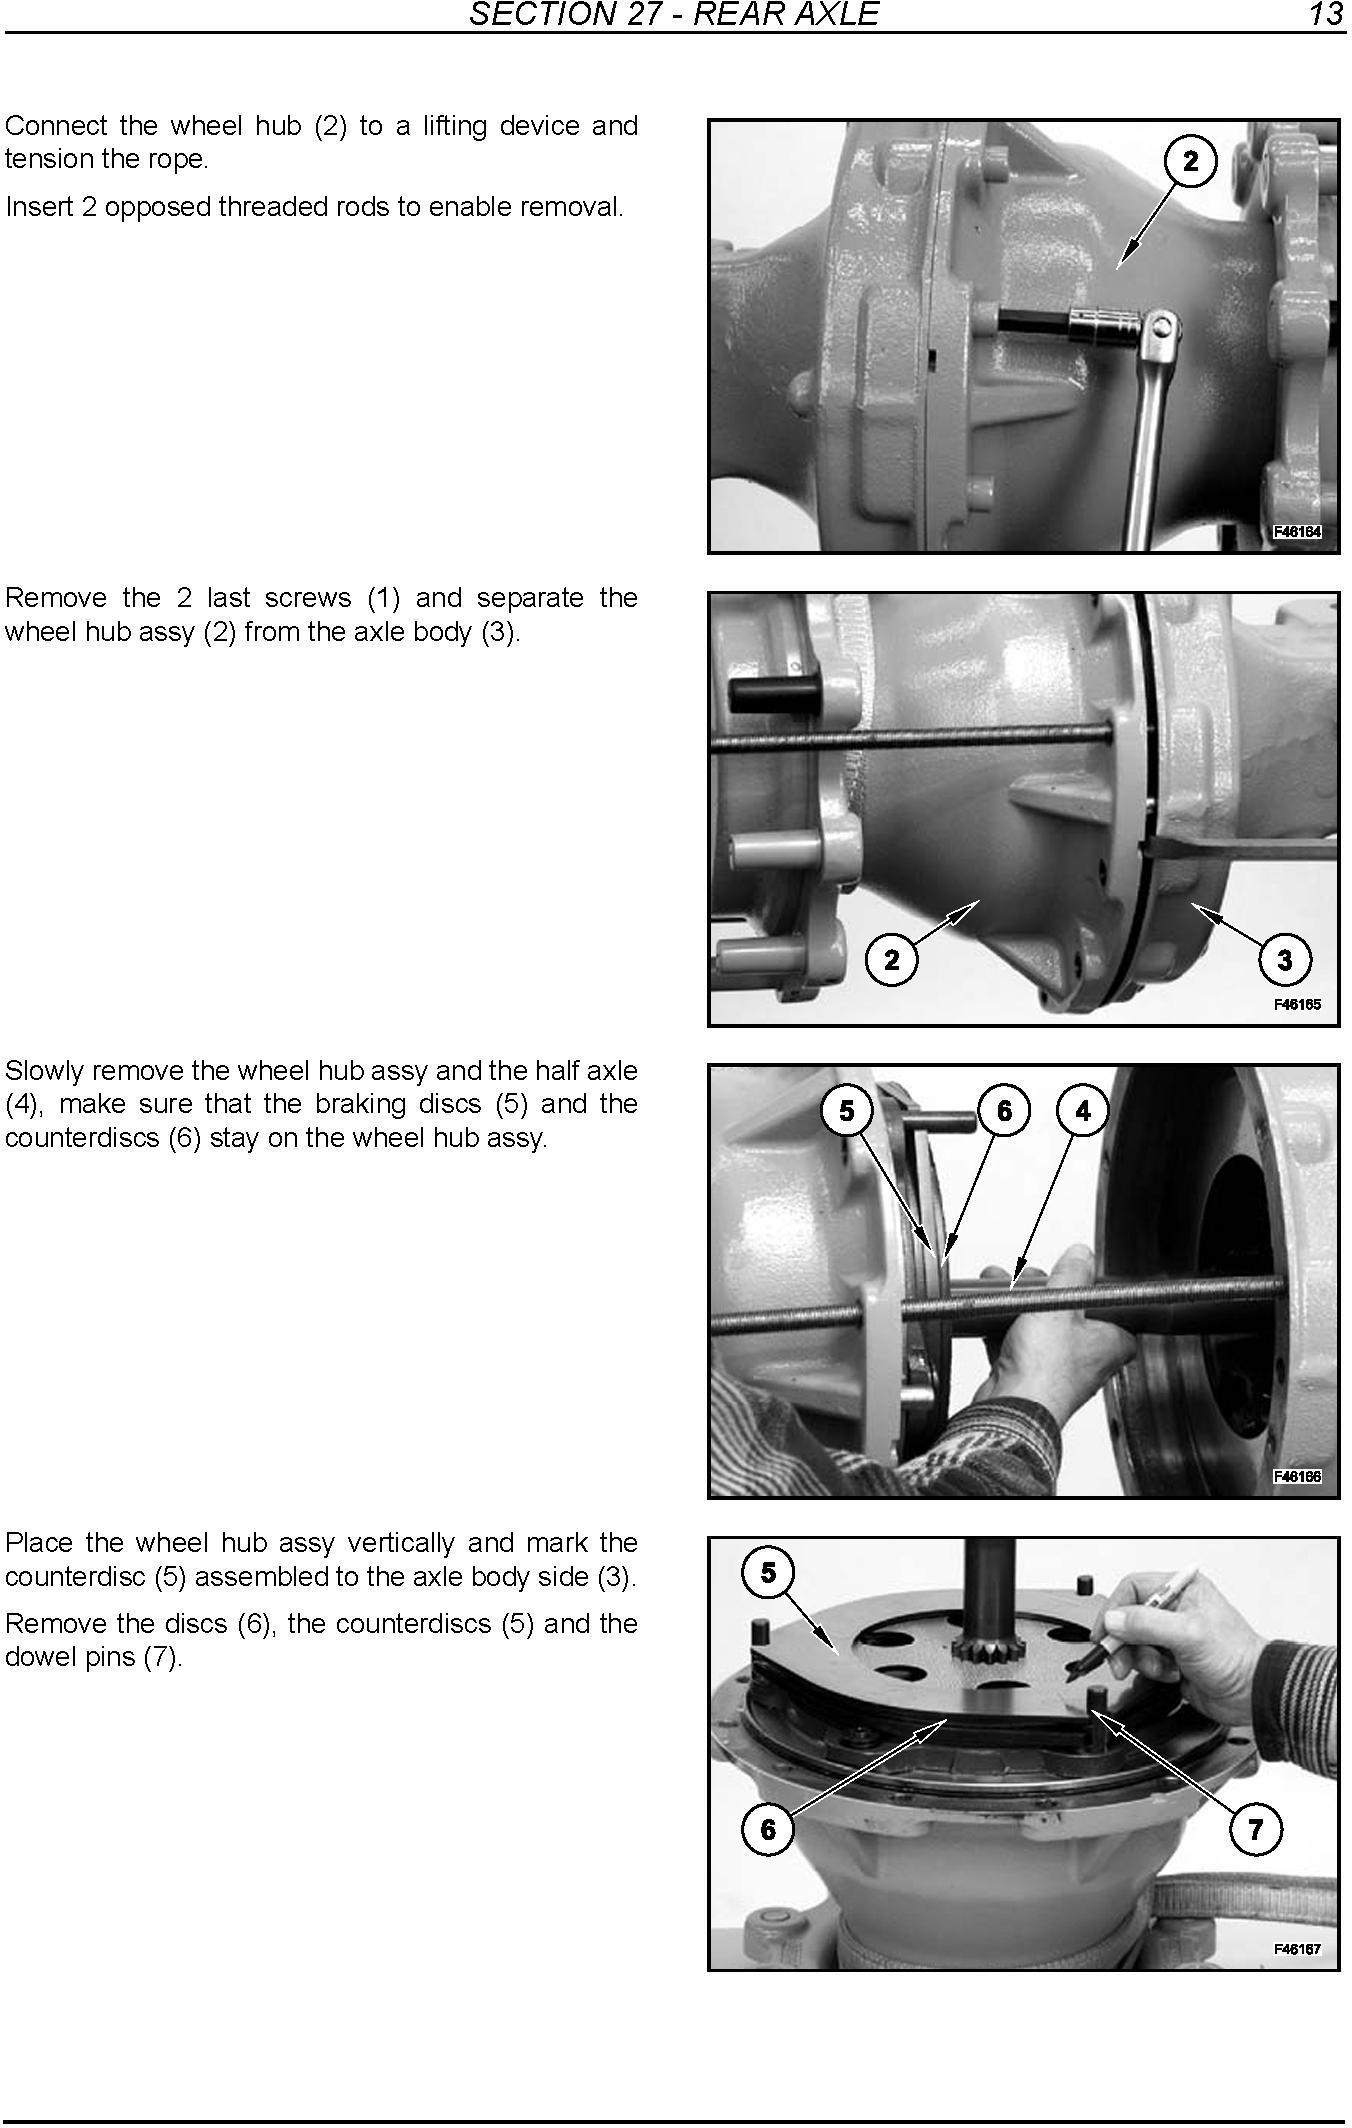 New Holland B110C, B95C, B95CLR, B95CTC Backhoe Loader Tier 4 Complete Service Manual - 3